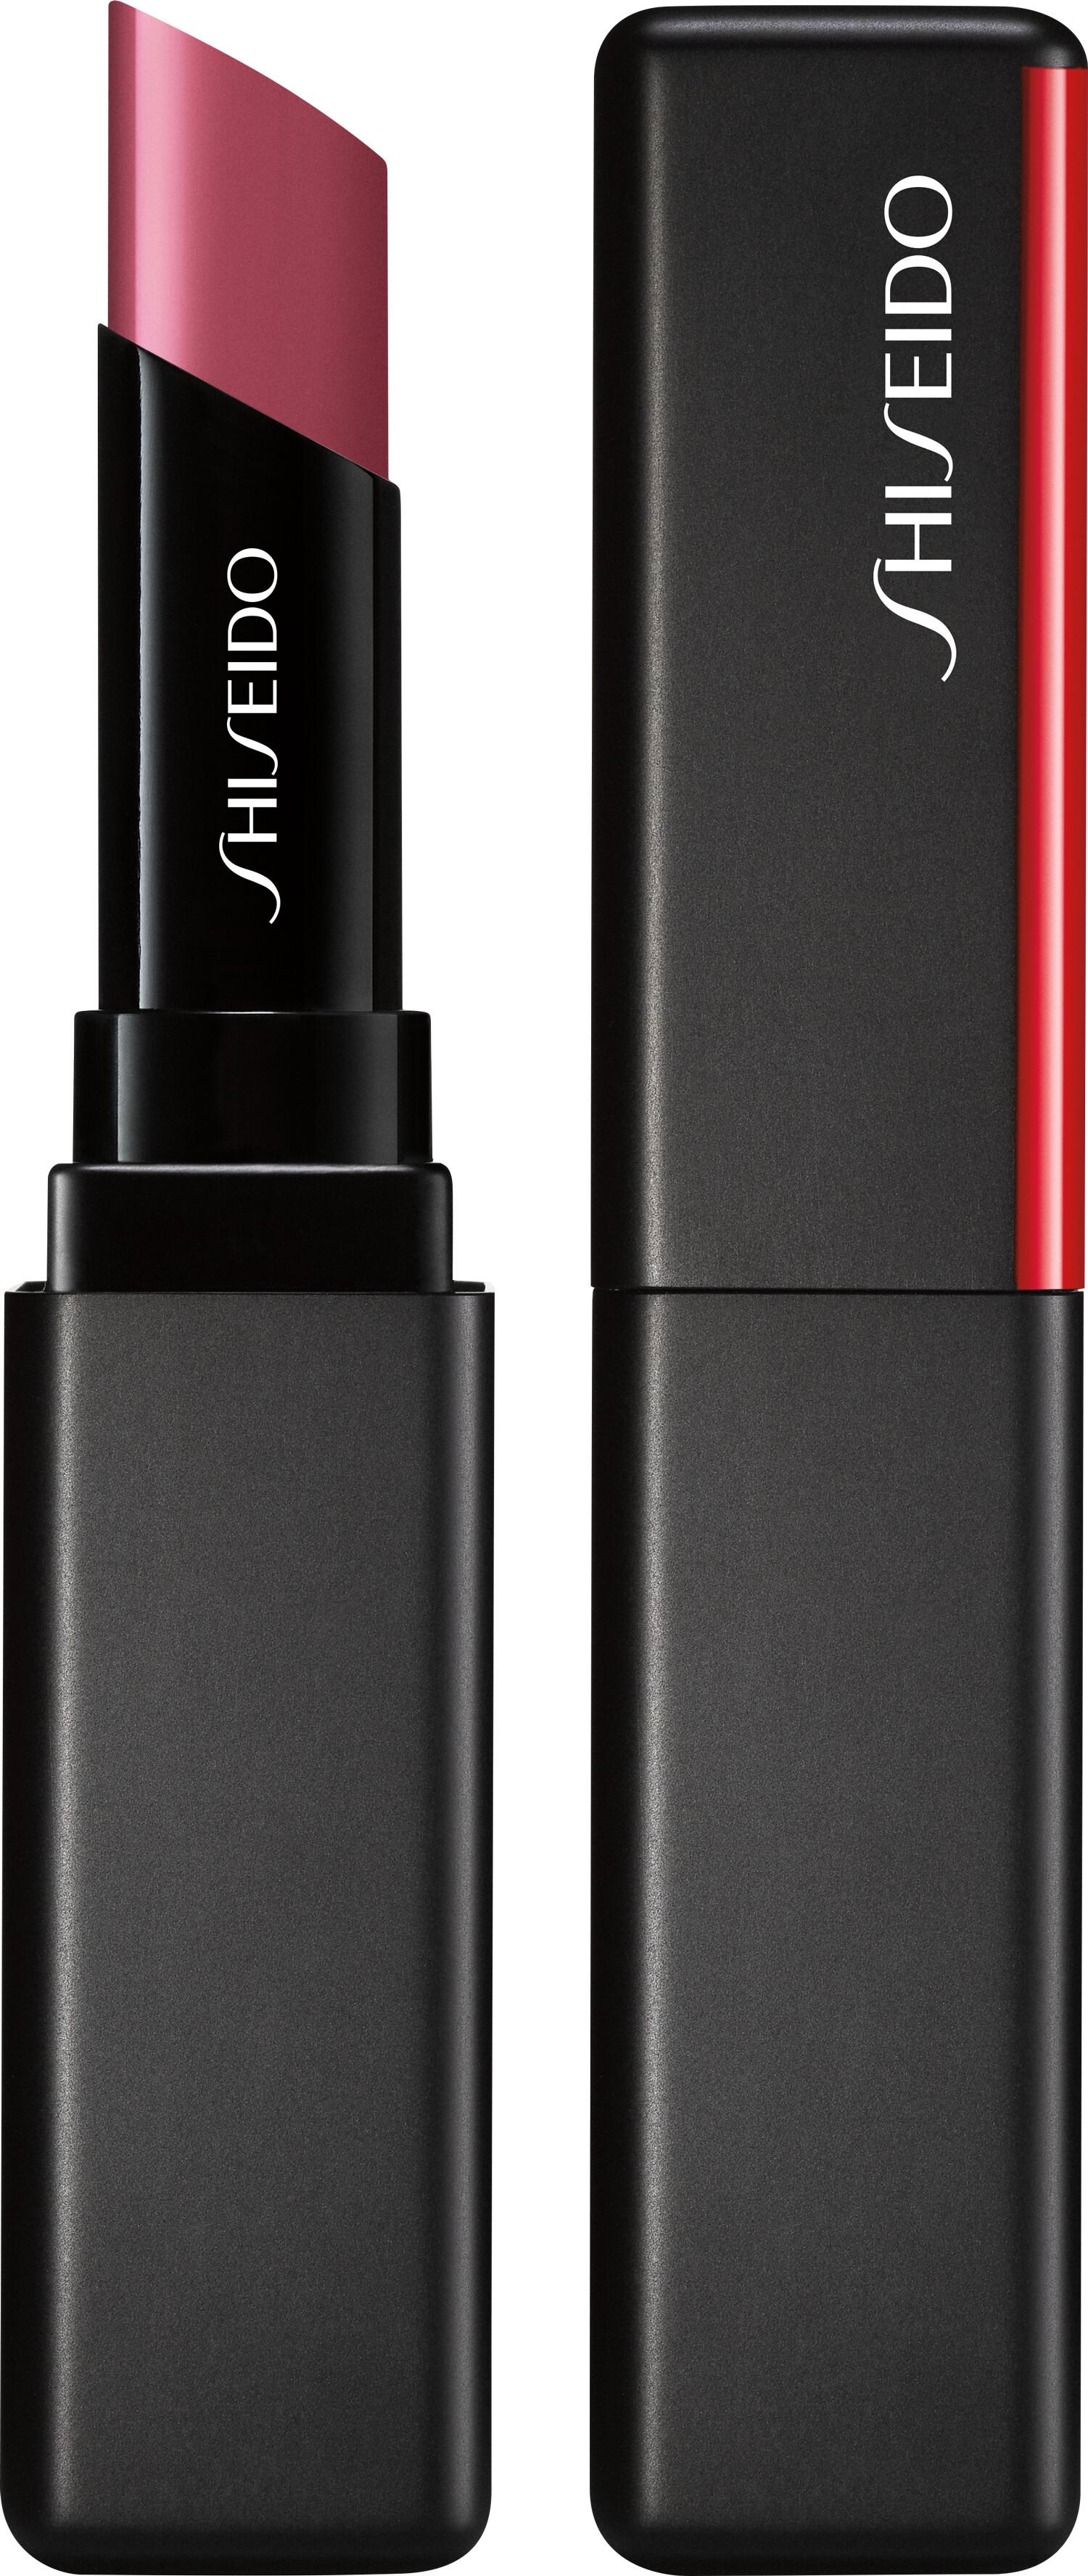 Shiseido VisionAiry Gel Lipstick 1.6g 211 - Rose Muse